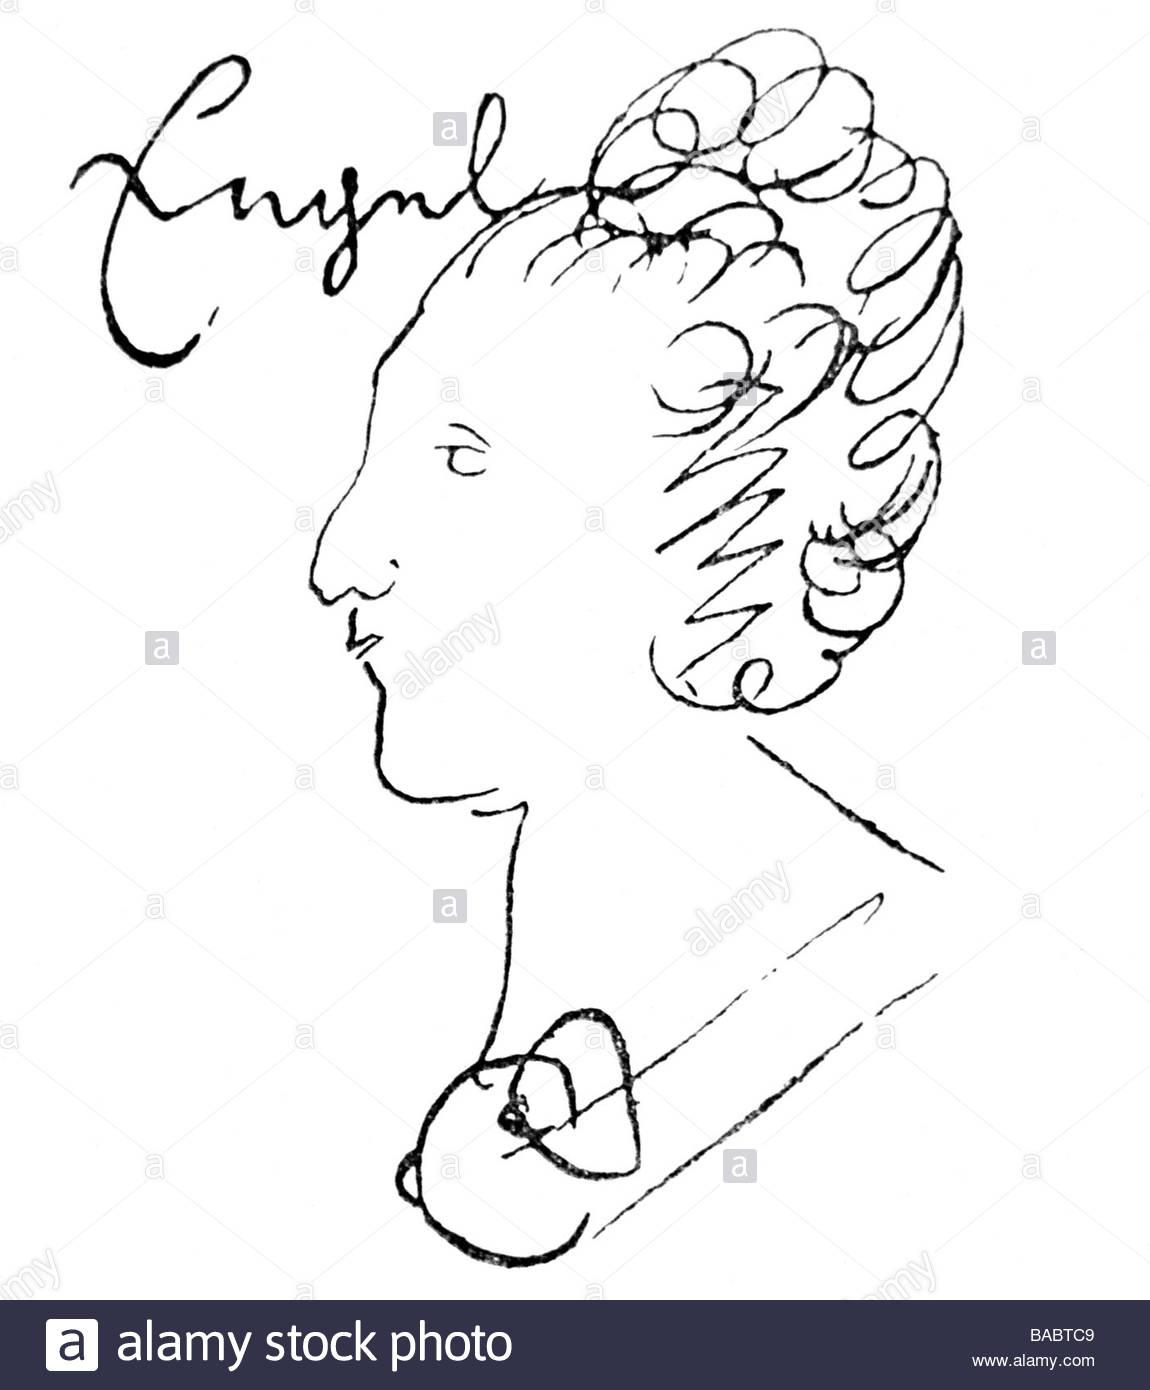 1150x1390 Mozart, Wolfgang Amadeus, 27.1.1756